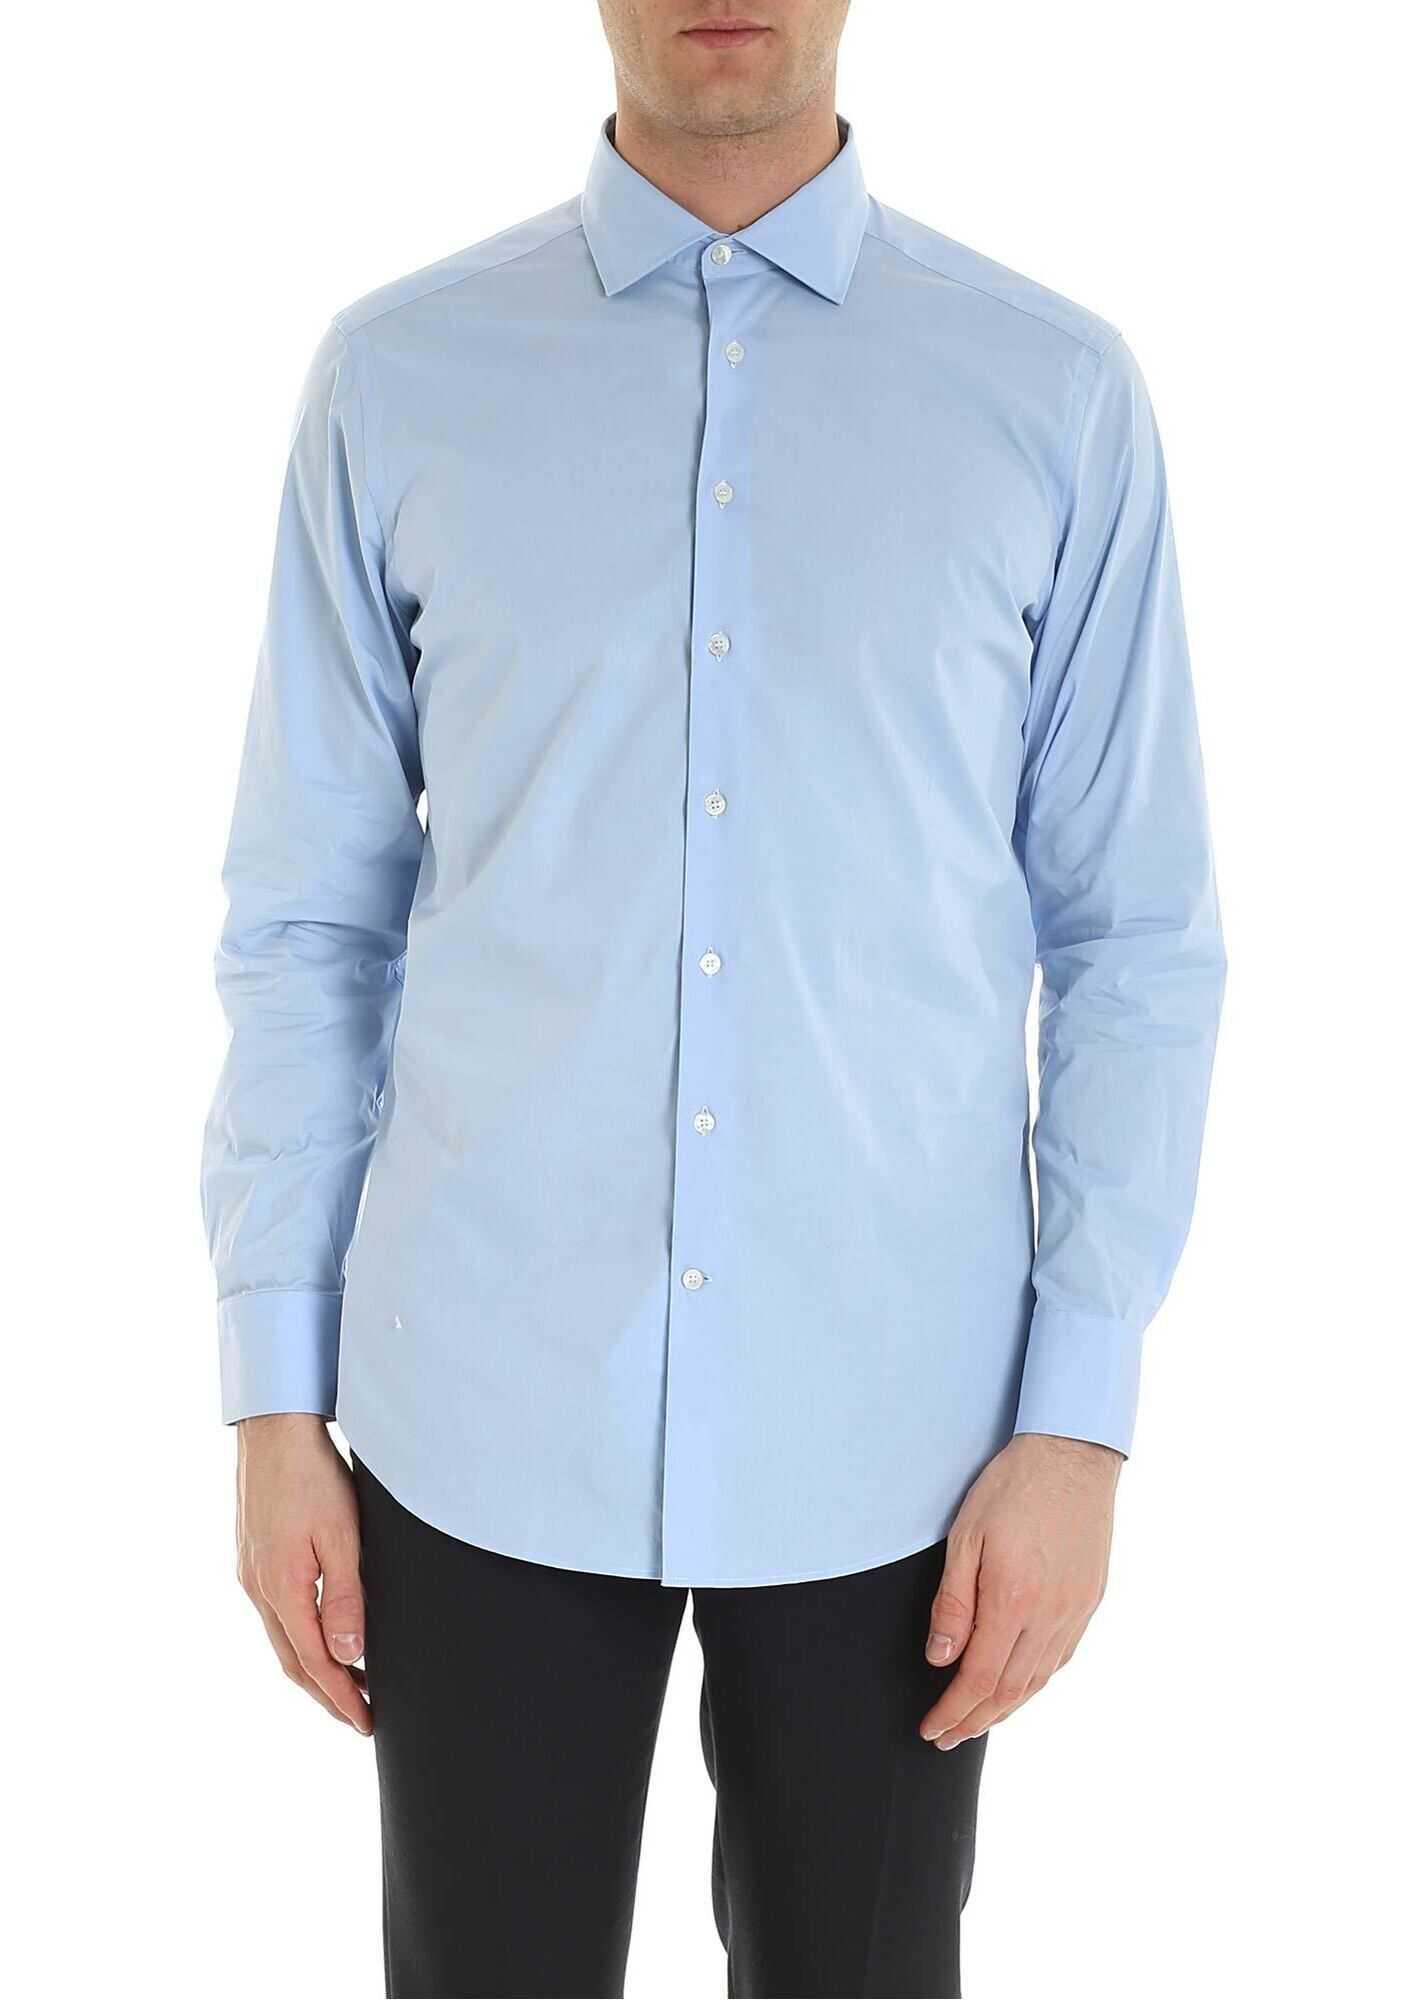 ETRO Light Blue Poplin Shirt thumbnail